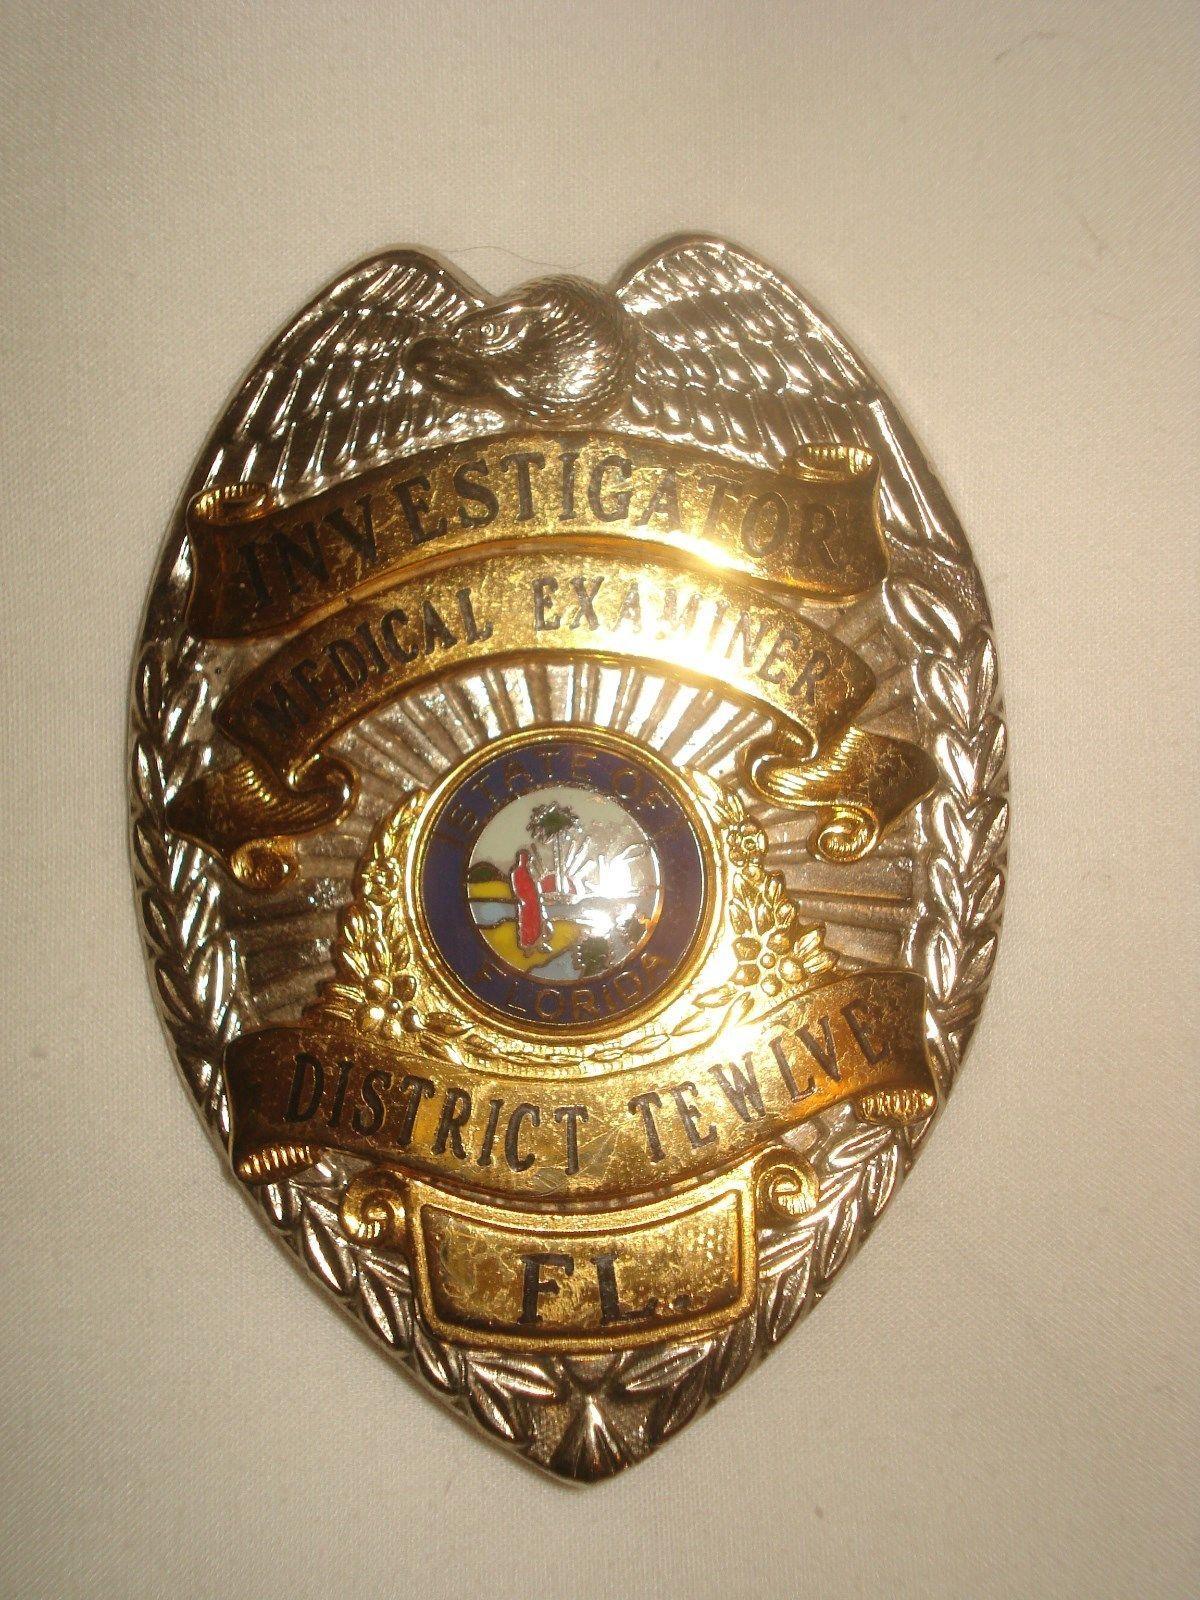 Investigator, Medical Examiner District Twelve, State of